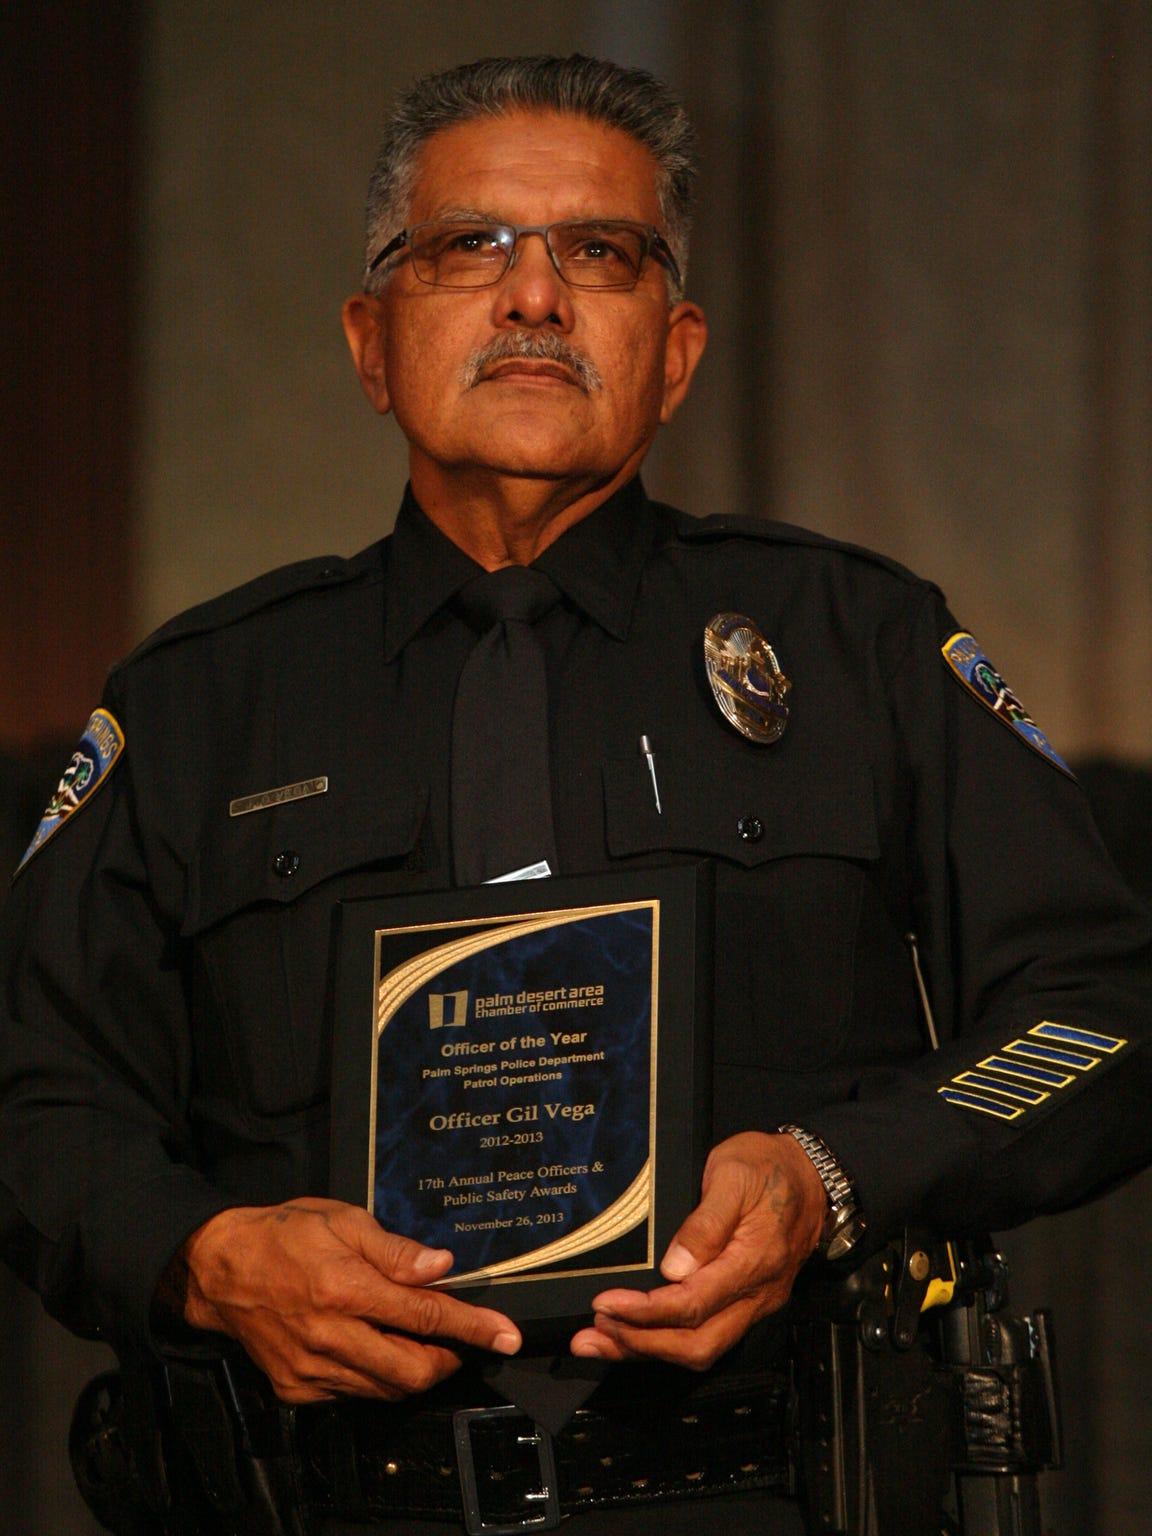 Officer Gil Vega is named Palm Springs Police Department